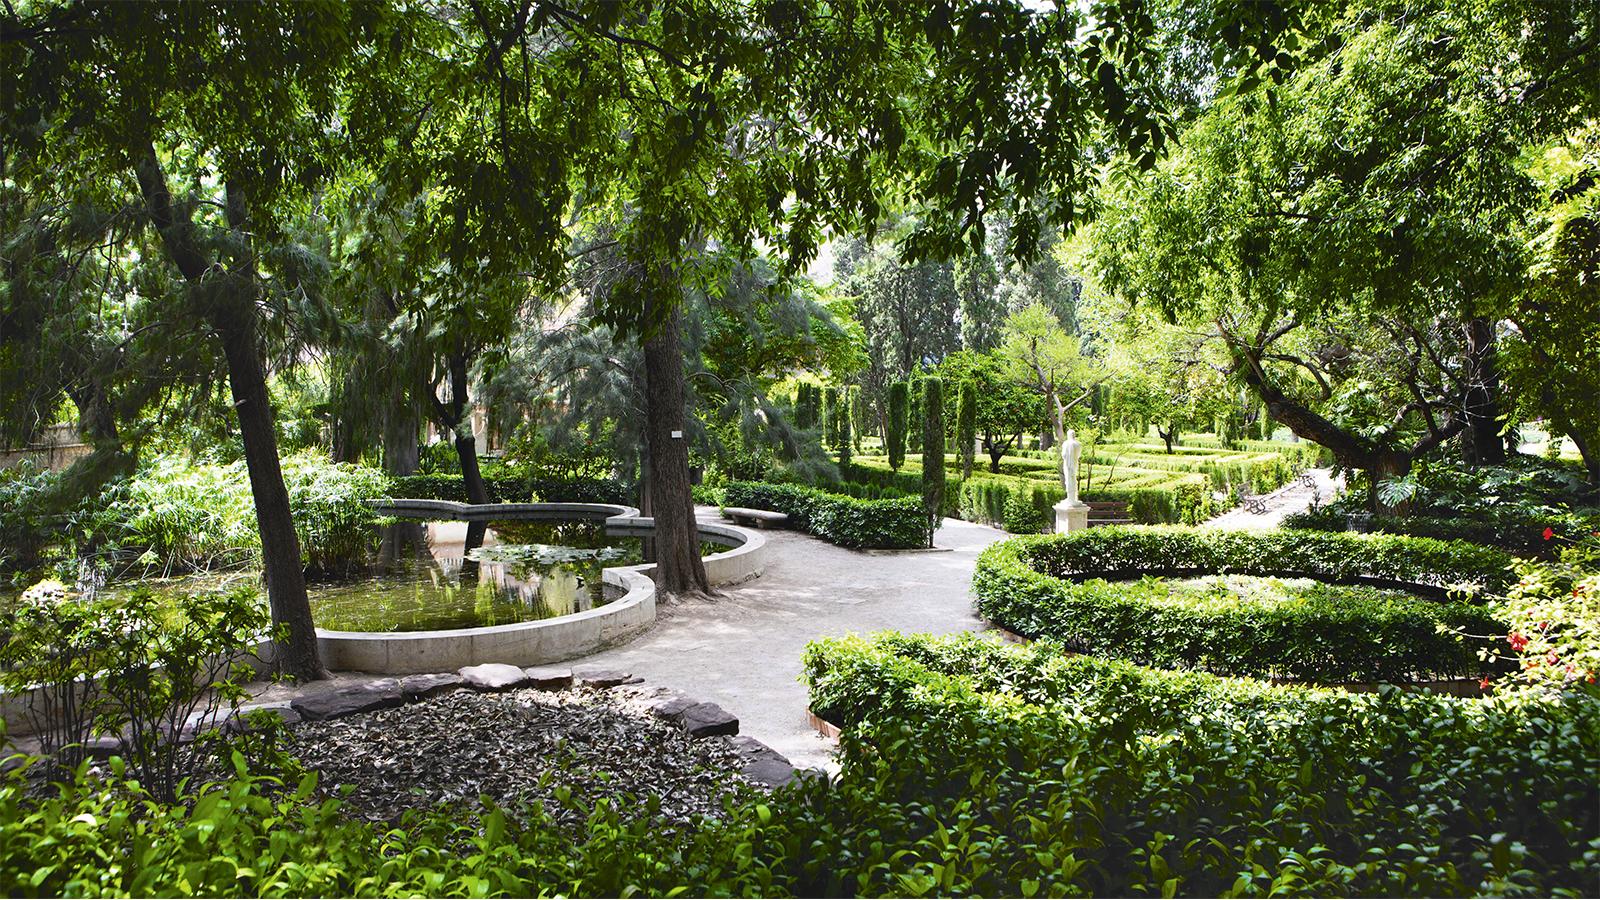 Beautiful Best U0027secretu0027 Urban Gardens Around The World   CNN Travel